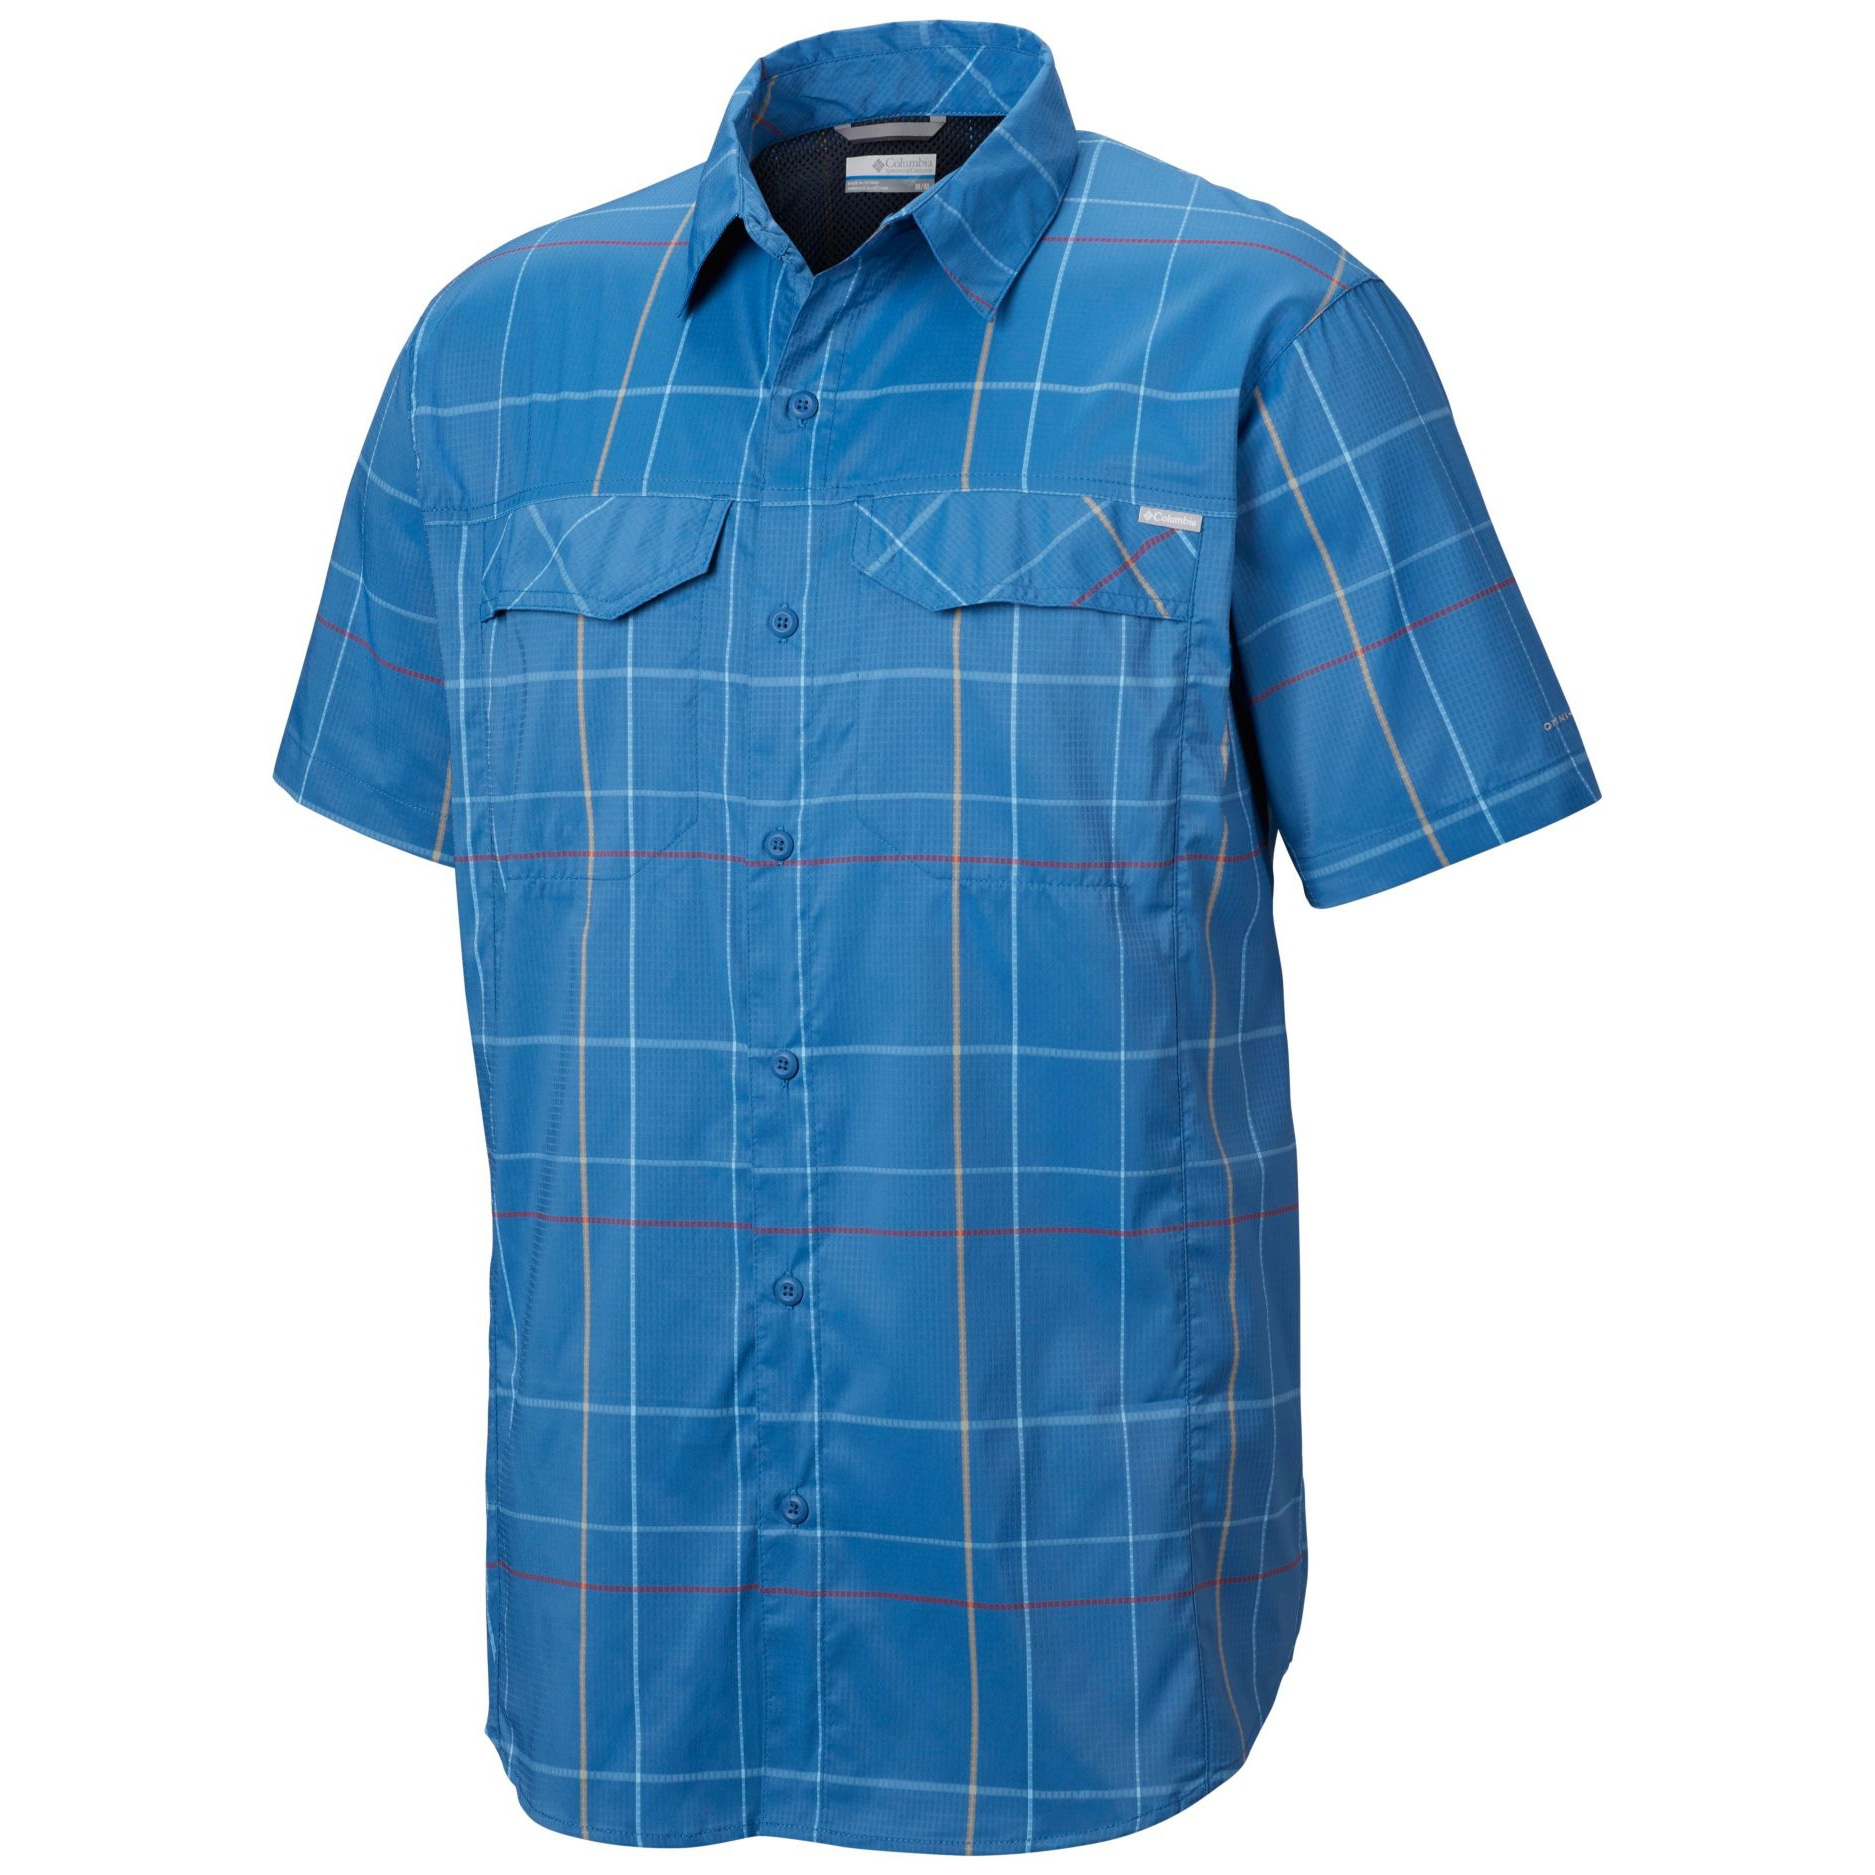 Silver Ridge Lite Plaid Shirt Short Sleeve - Men's